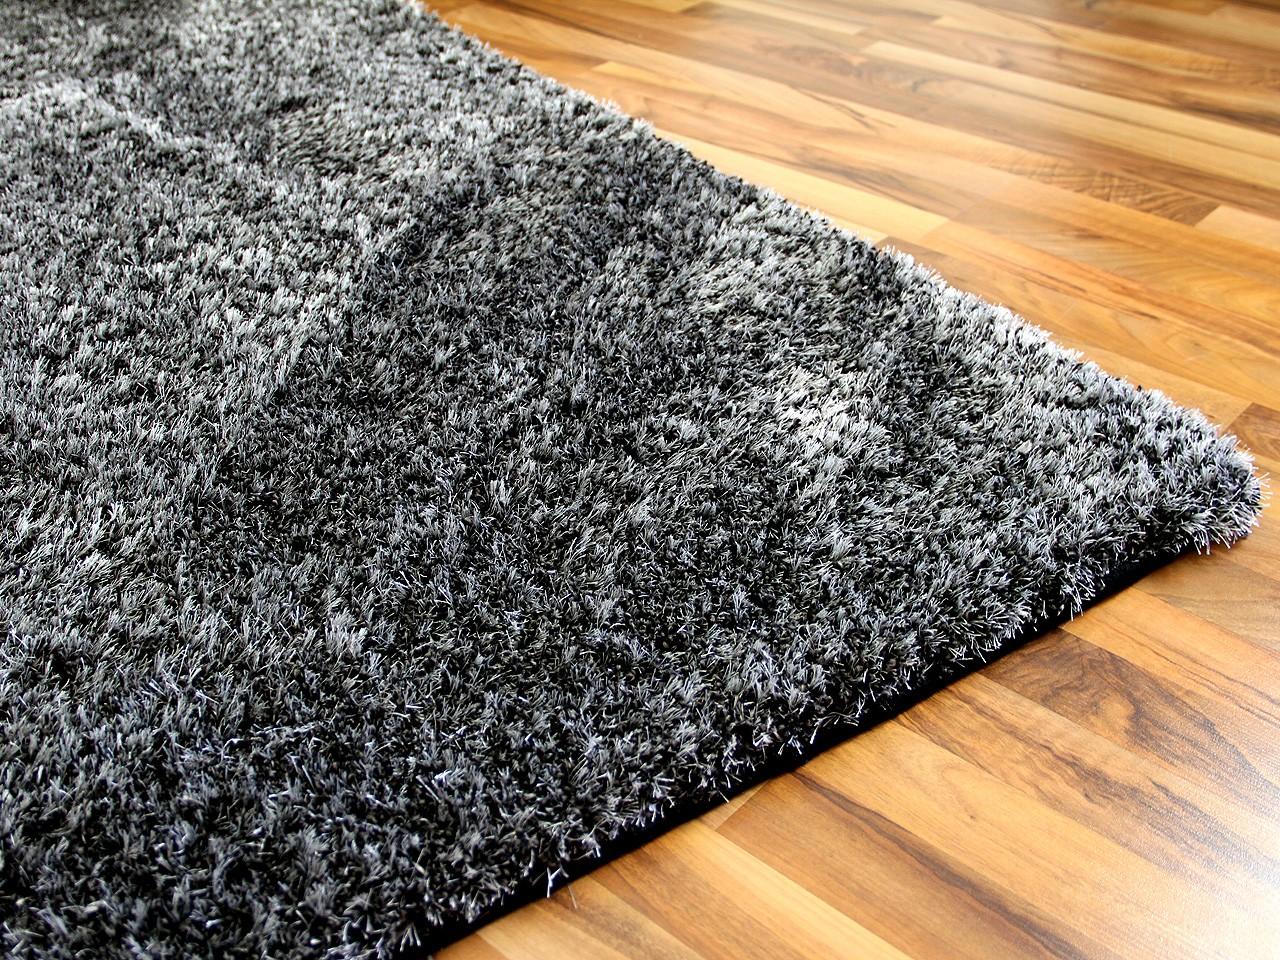 hochflor shaggy teppich luxus feeling mix anthrazit teppiche hochflor langflor teppiche schwarz. Black Bedroom Furniture Sets. Home Design Ideas